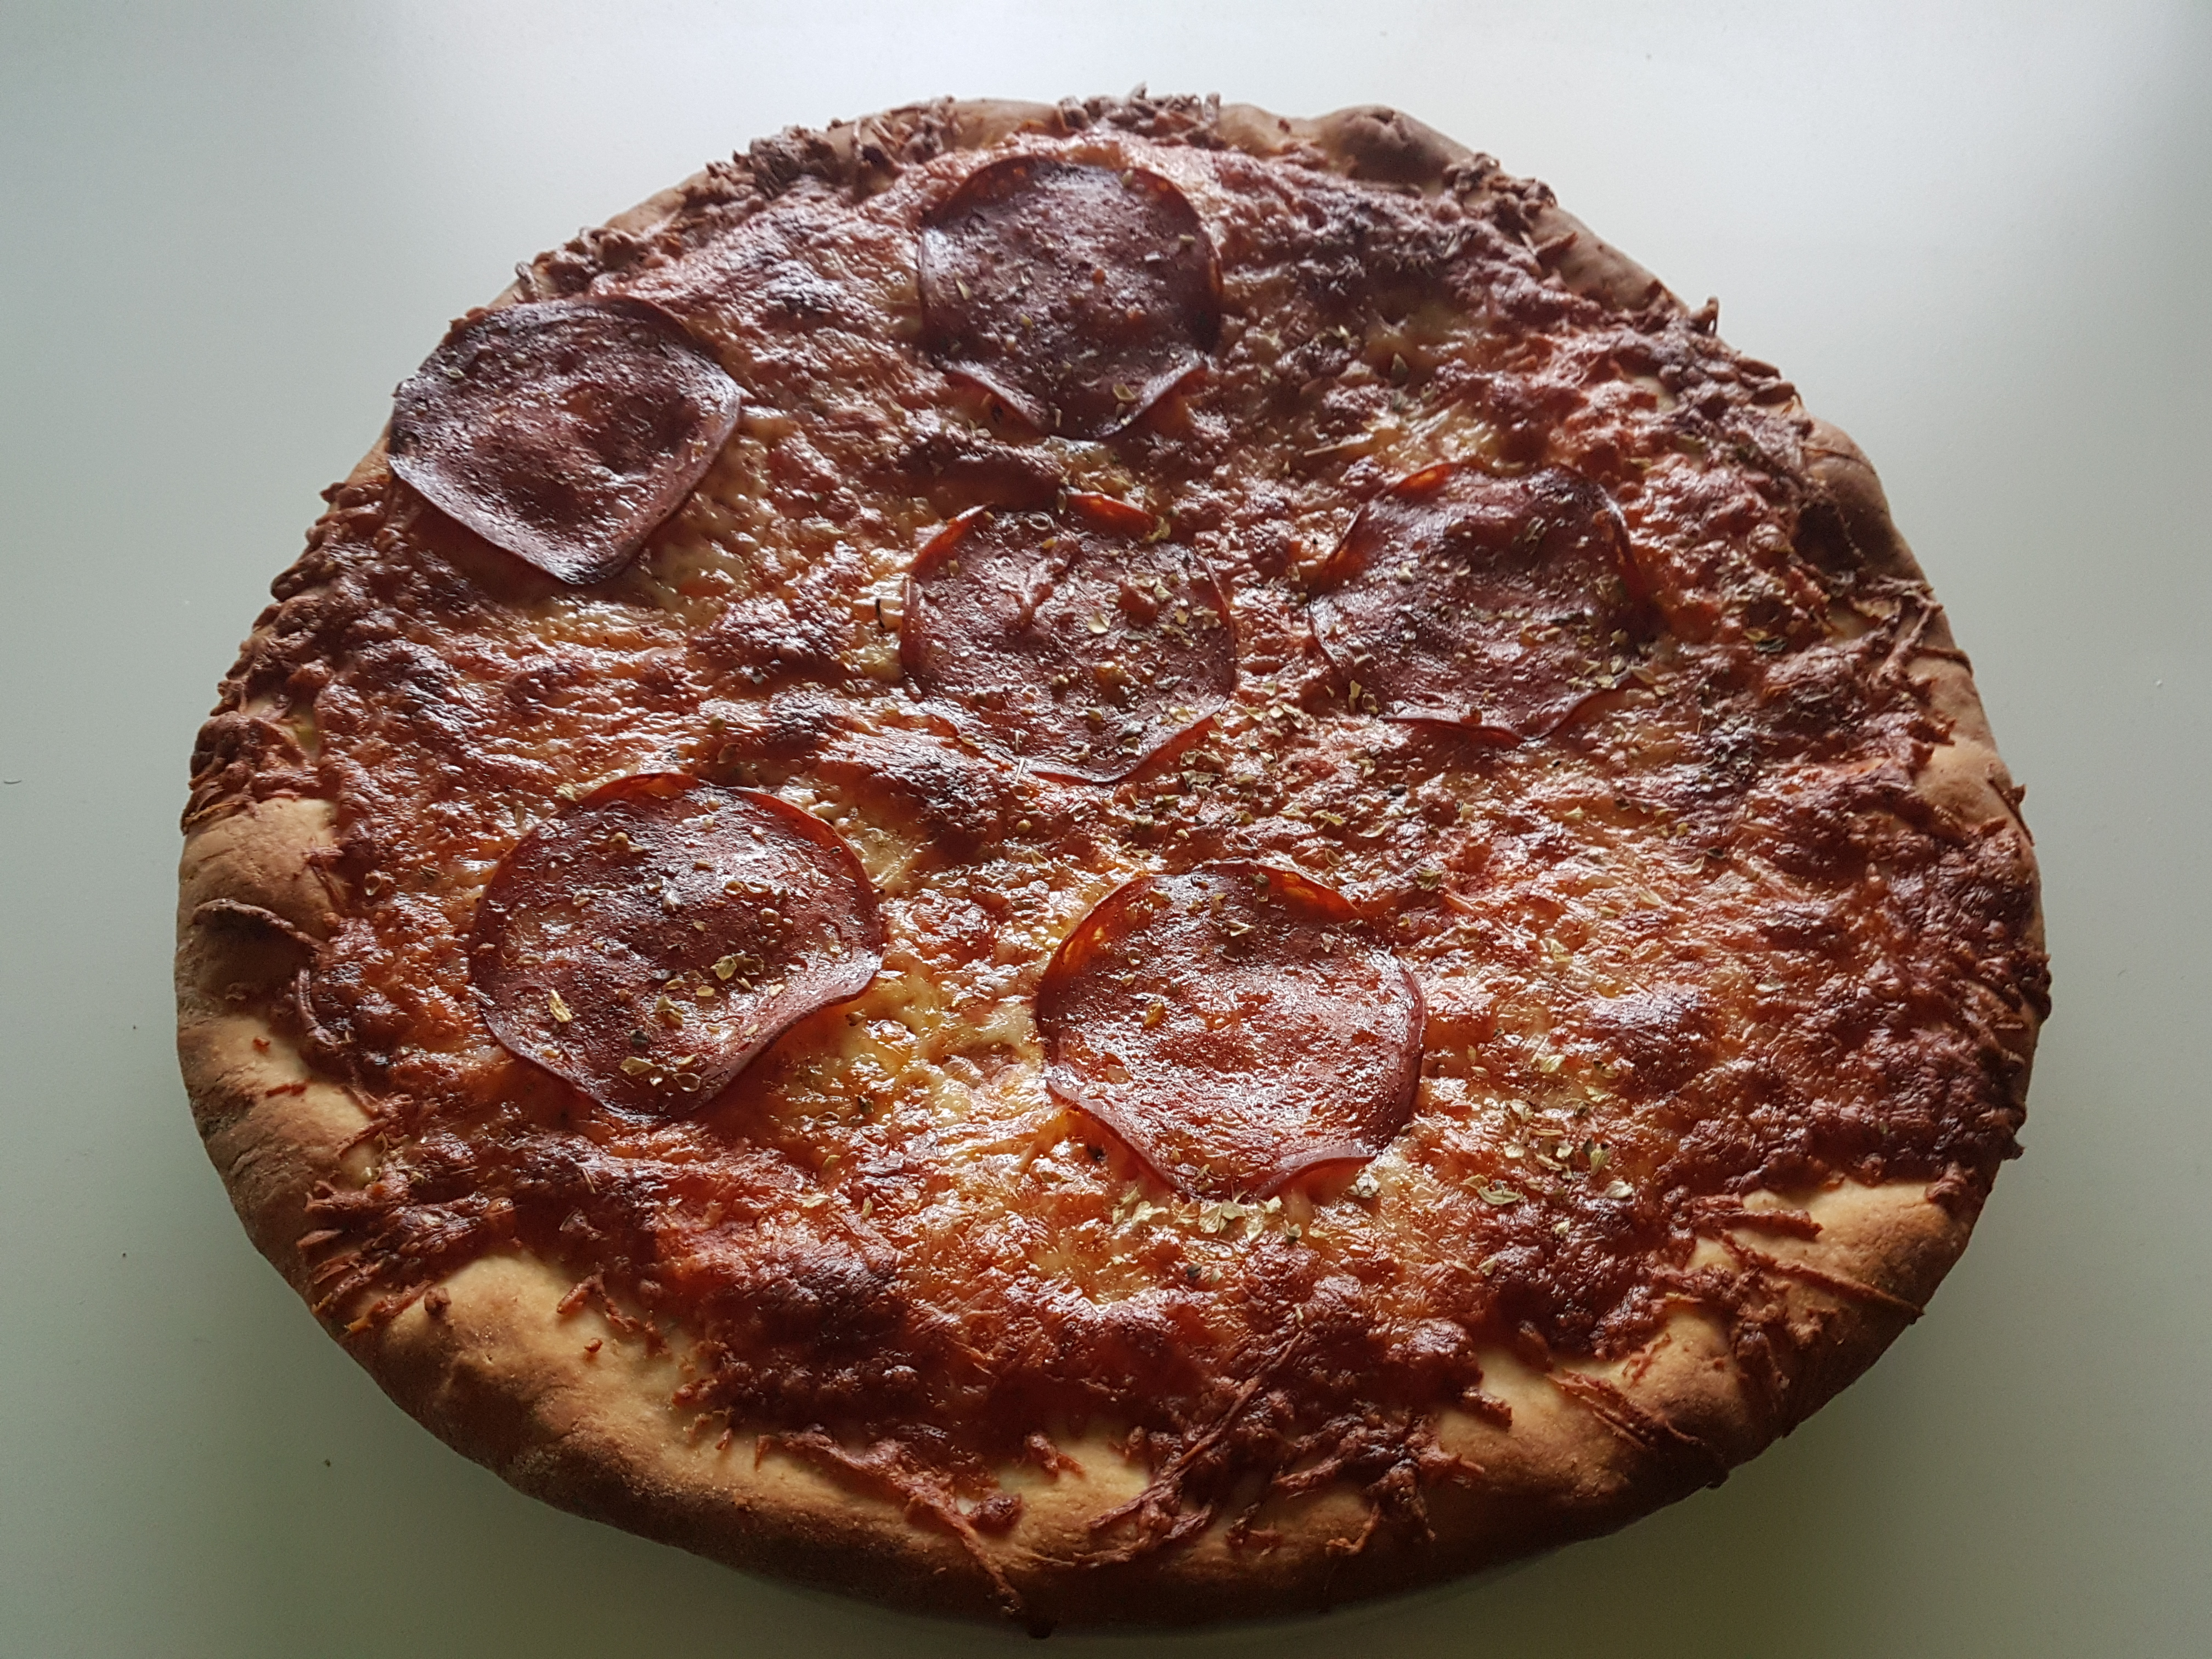 http://foodloader.net/Holz_2018-10-31_Pizza.jpg